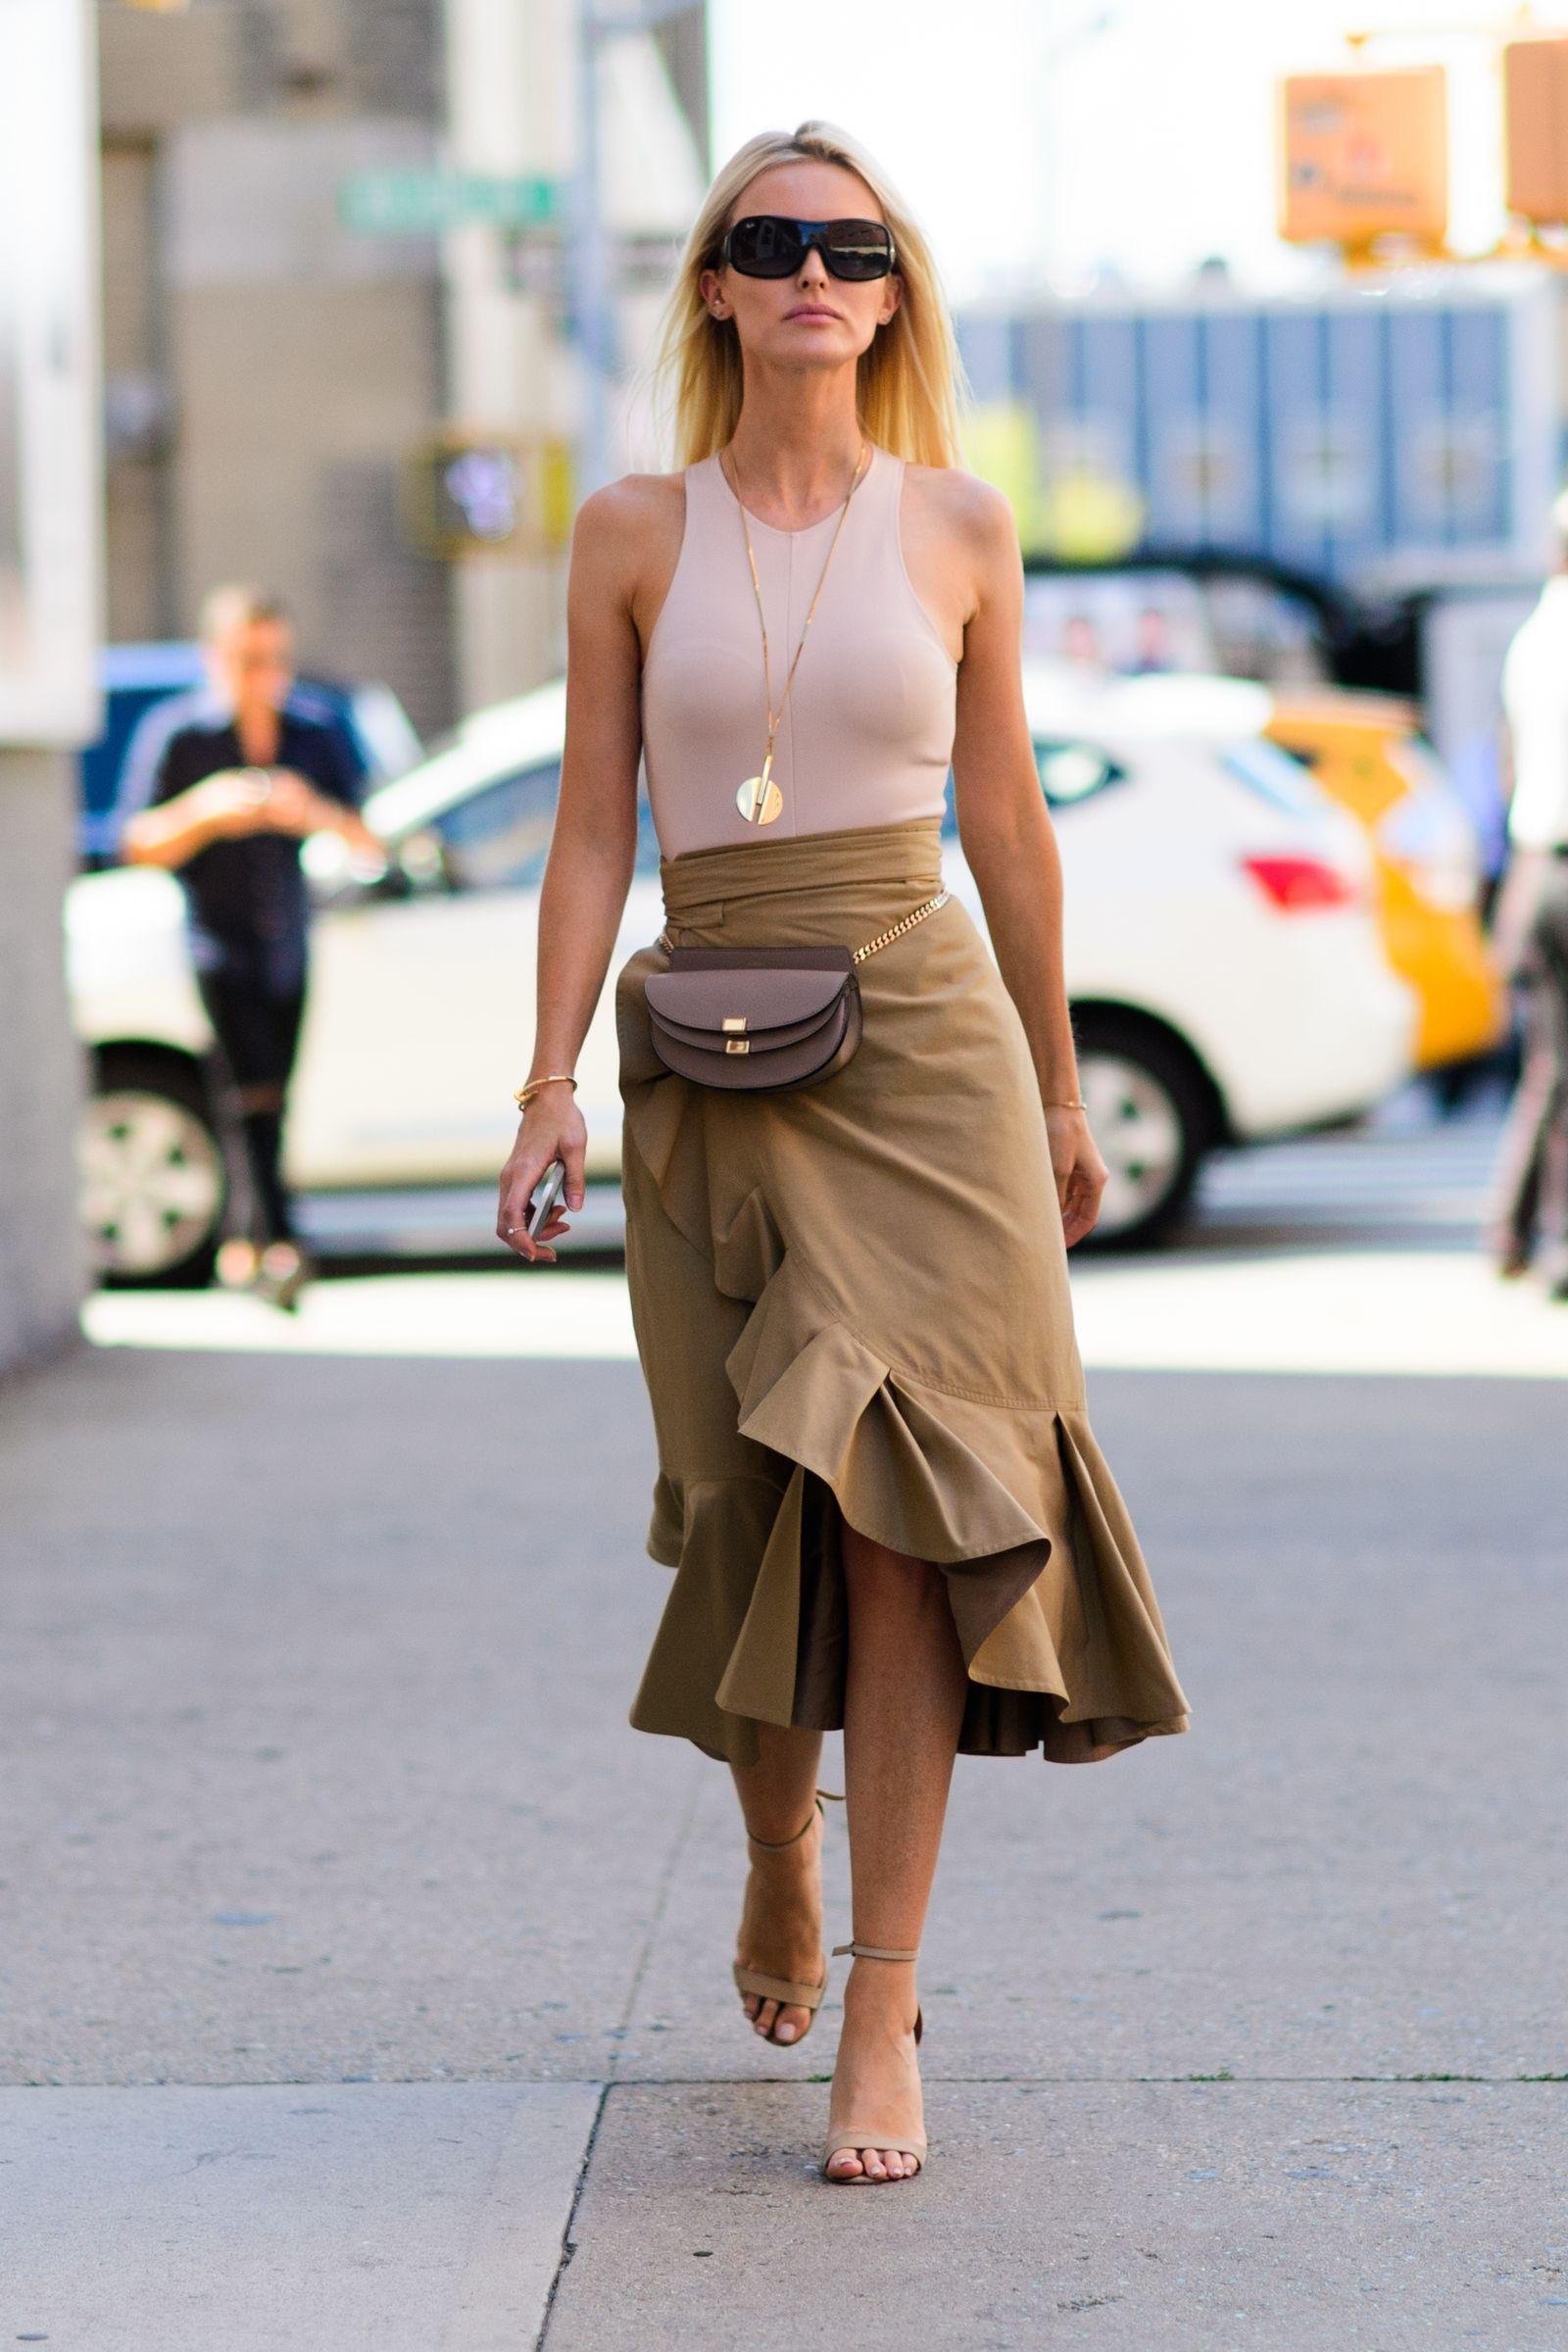 Бежевая юбка на одну сторону